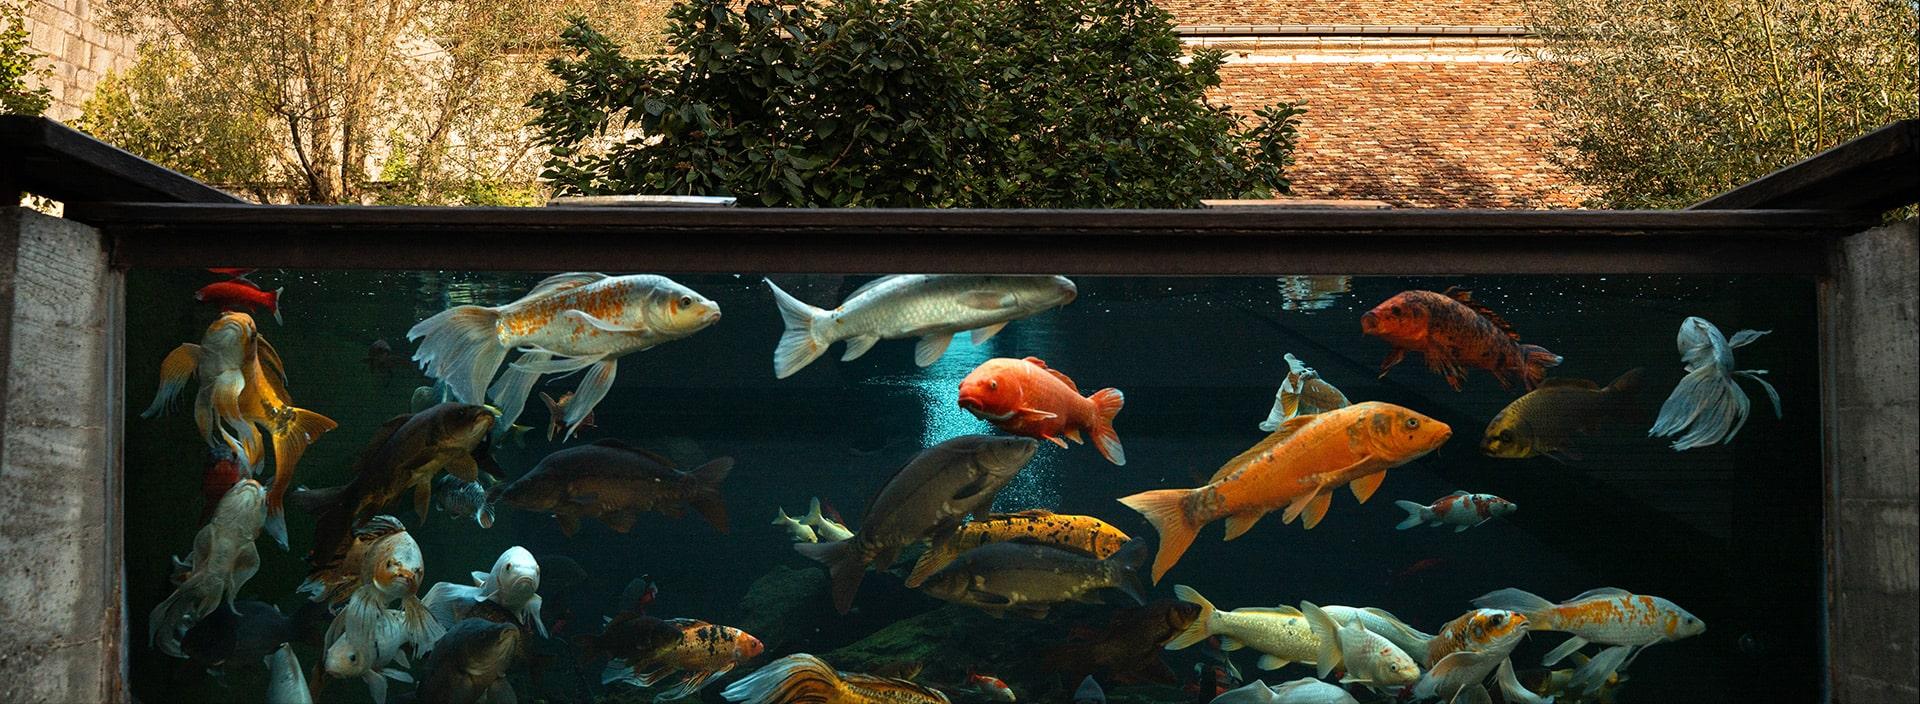 Les espaces animaliers